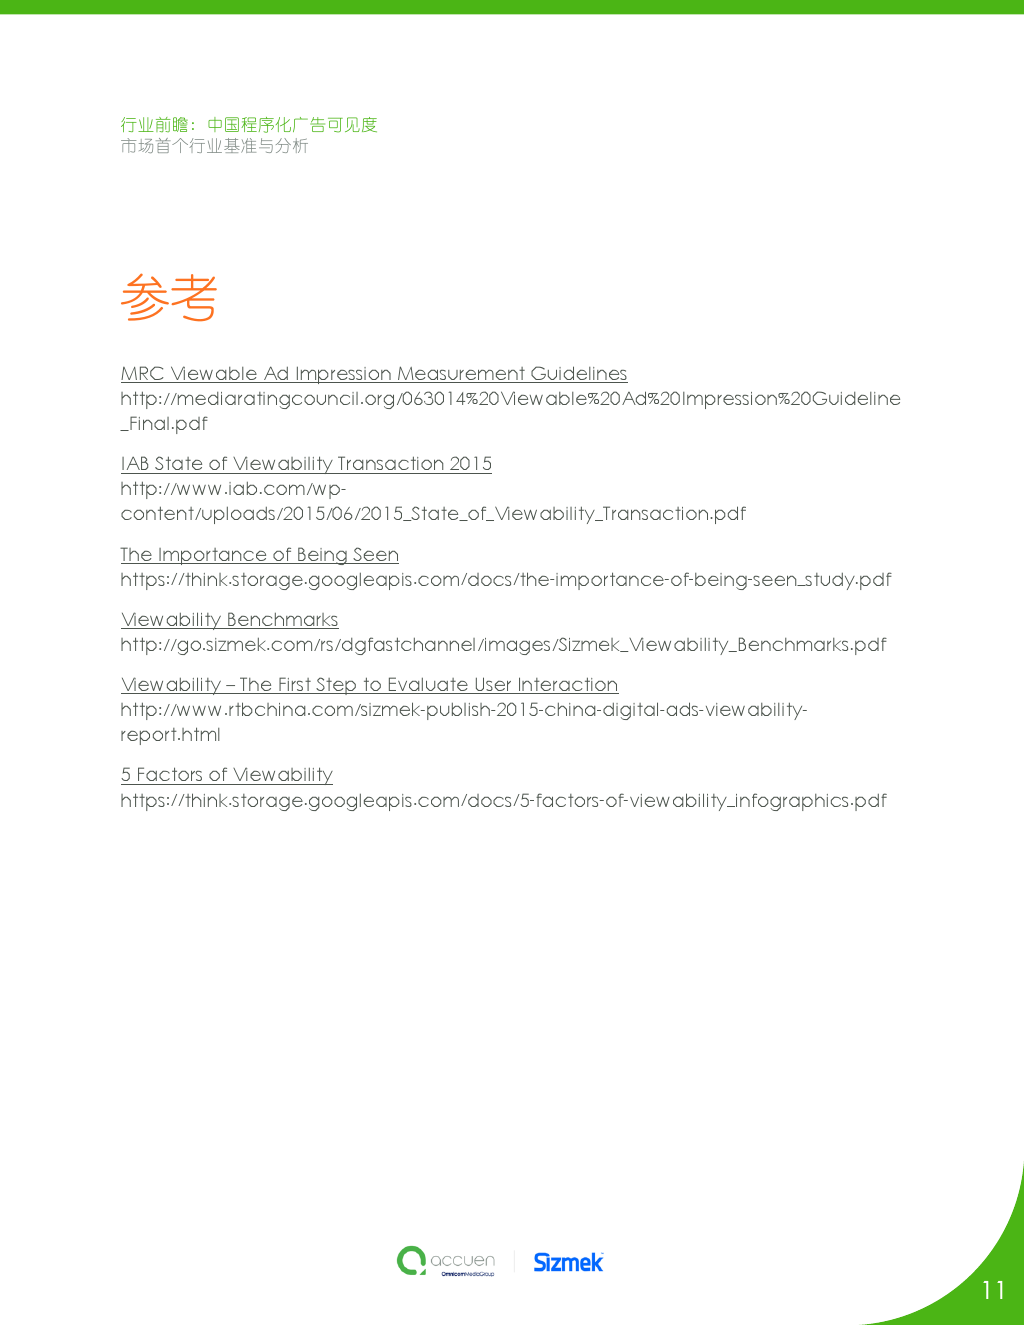 Viewability_Accuen_000011